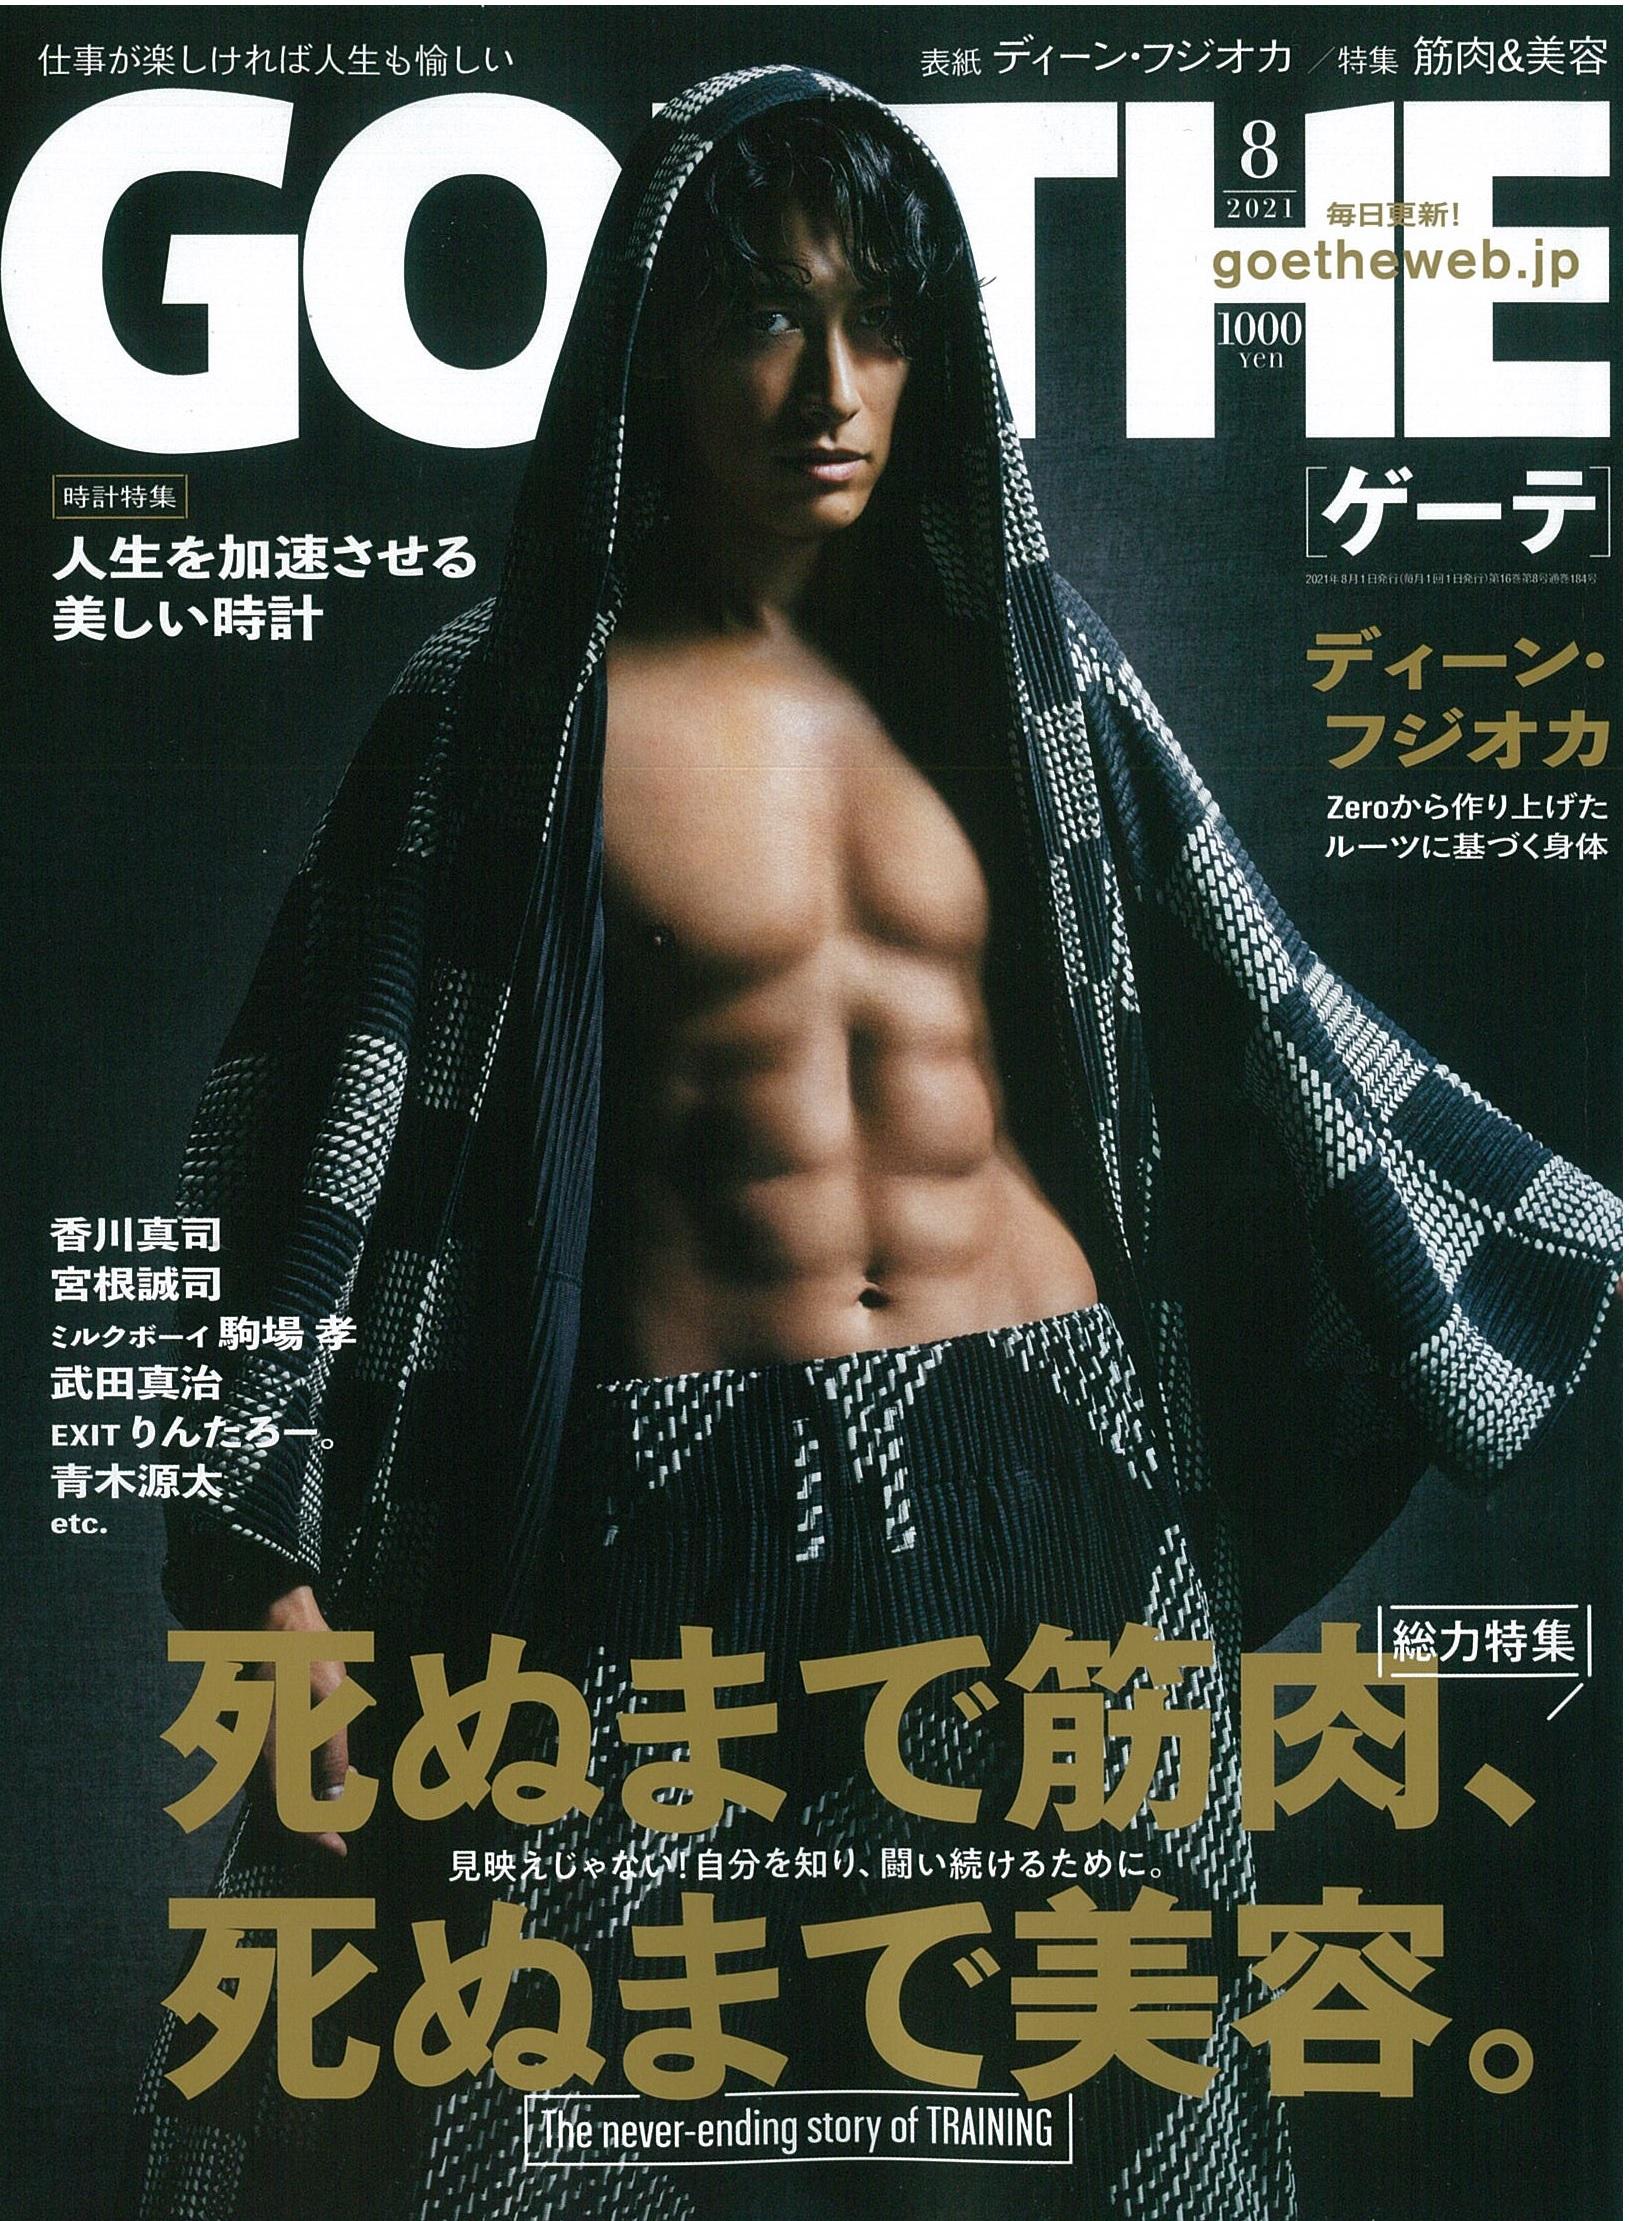 GOETHE2021年6月24日発売・8月号)